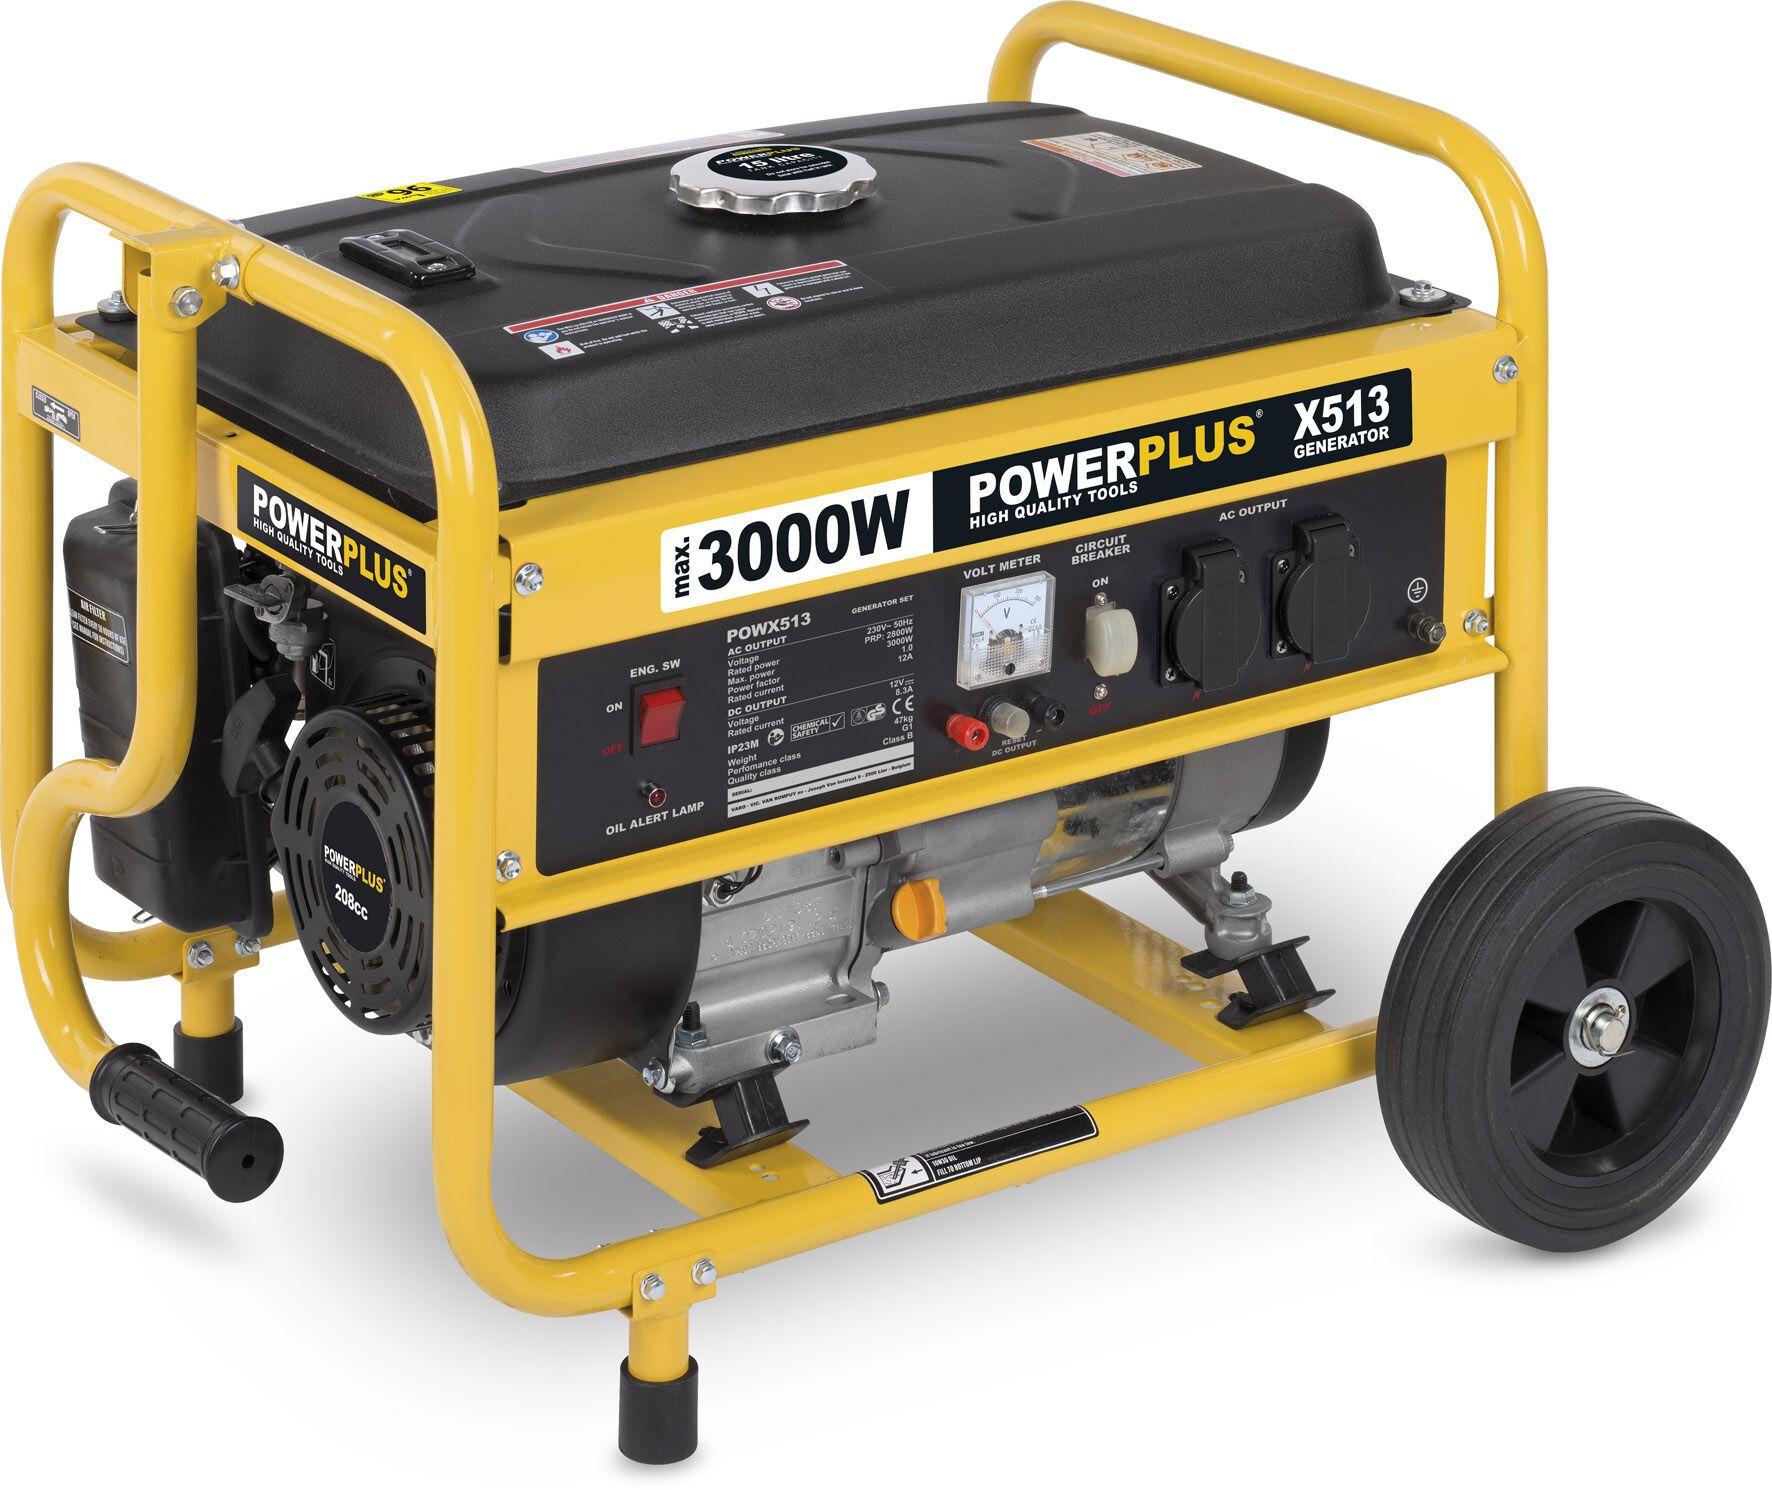 Powerplus POWX513 Benzine generator 208cc | Aggregaat 3000W 230V